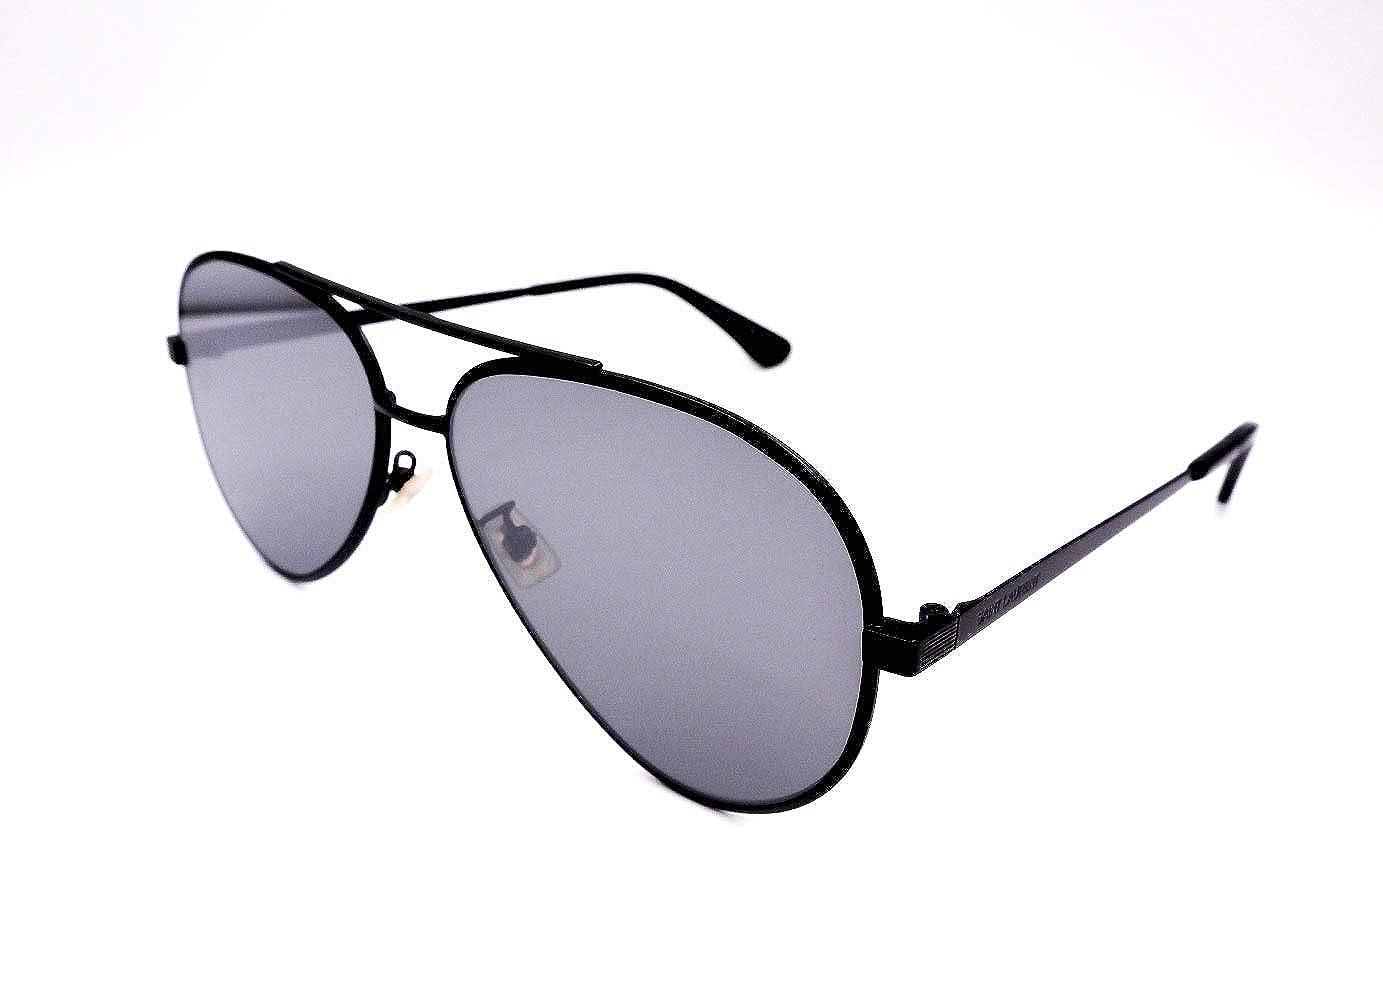 5aae0c4402f Amazon.com  Authentic YVES SAINT LAURENT Black Aviator Sunglasses Classic  11 Zero-003NEW  Clothing